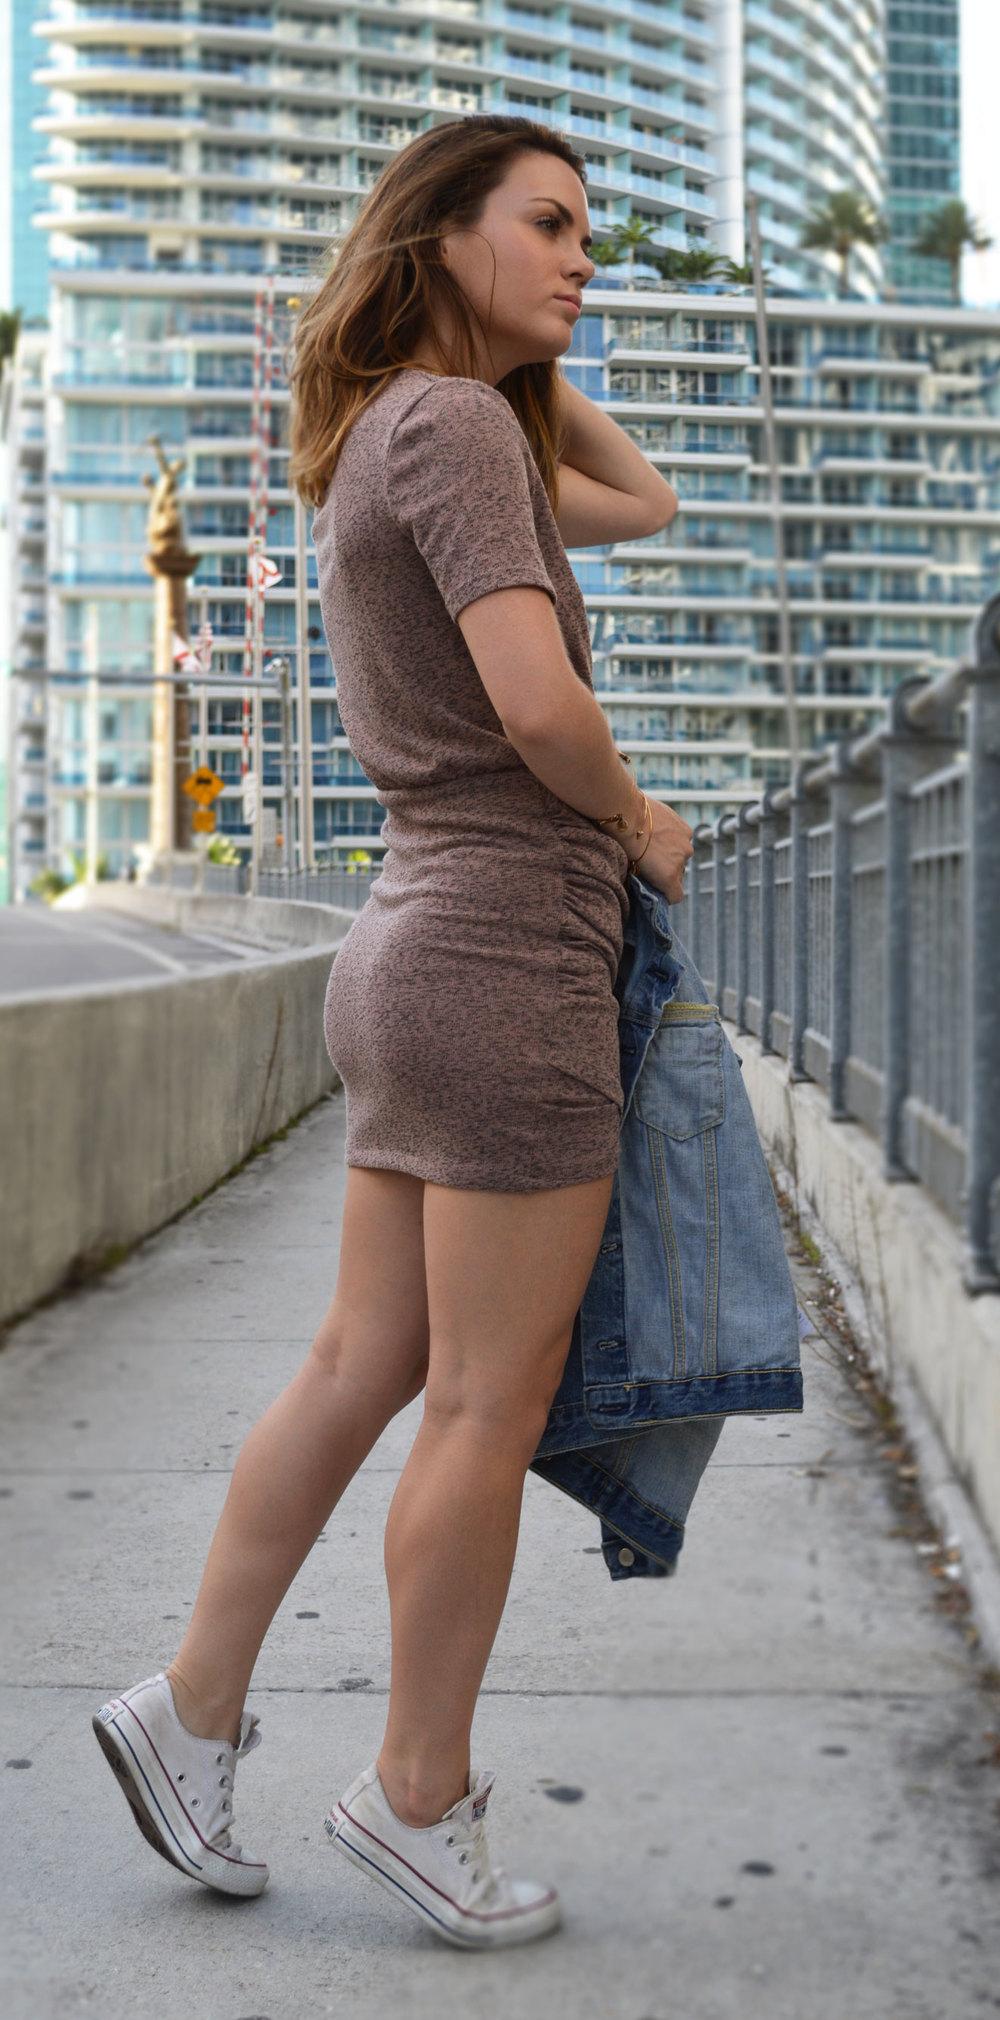 FromCtoC-Mauve-Zara-Tulip-Dress-GAP-Vest-converse-classics-miami-florida.jpeg